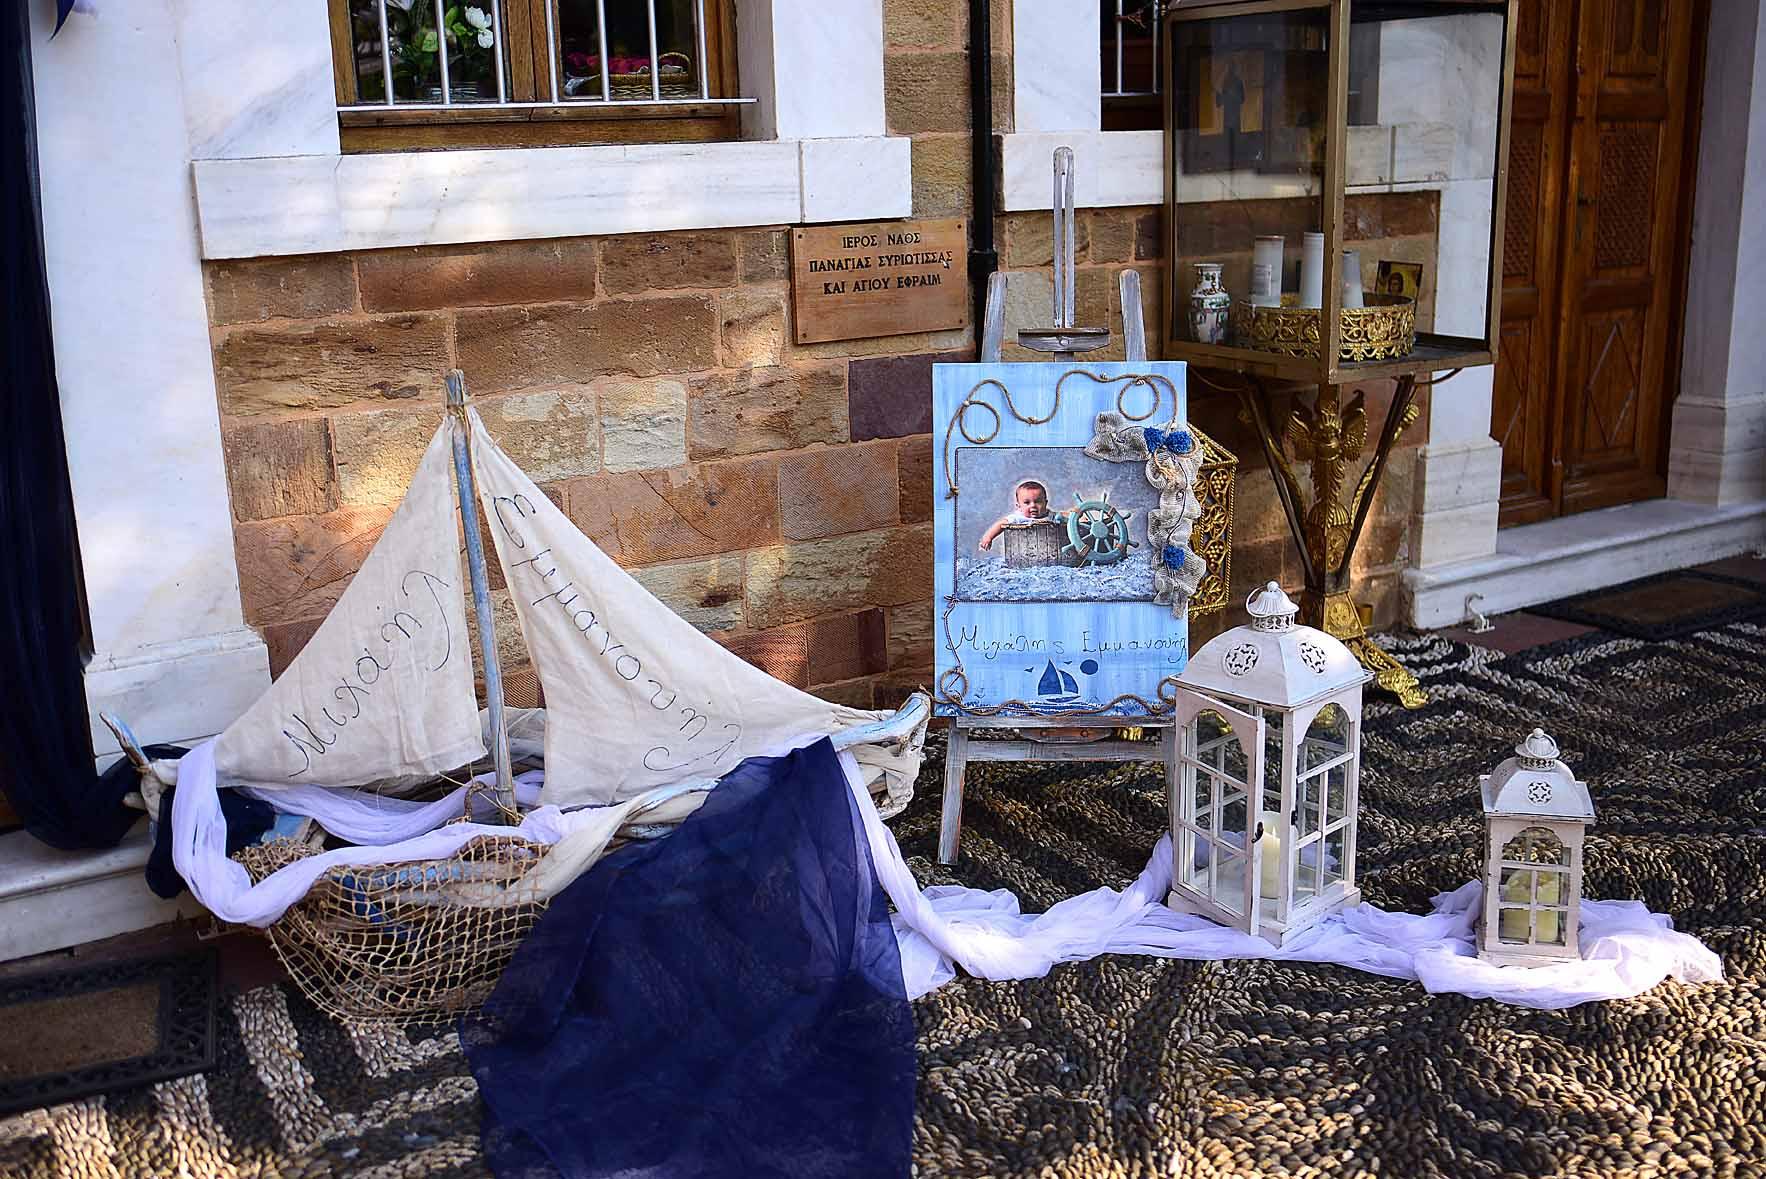 panagia-siriotissa-kampos-chios-christening-baptism-alexis-koumaditis-photography-01